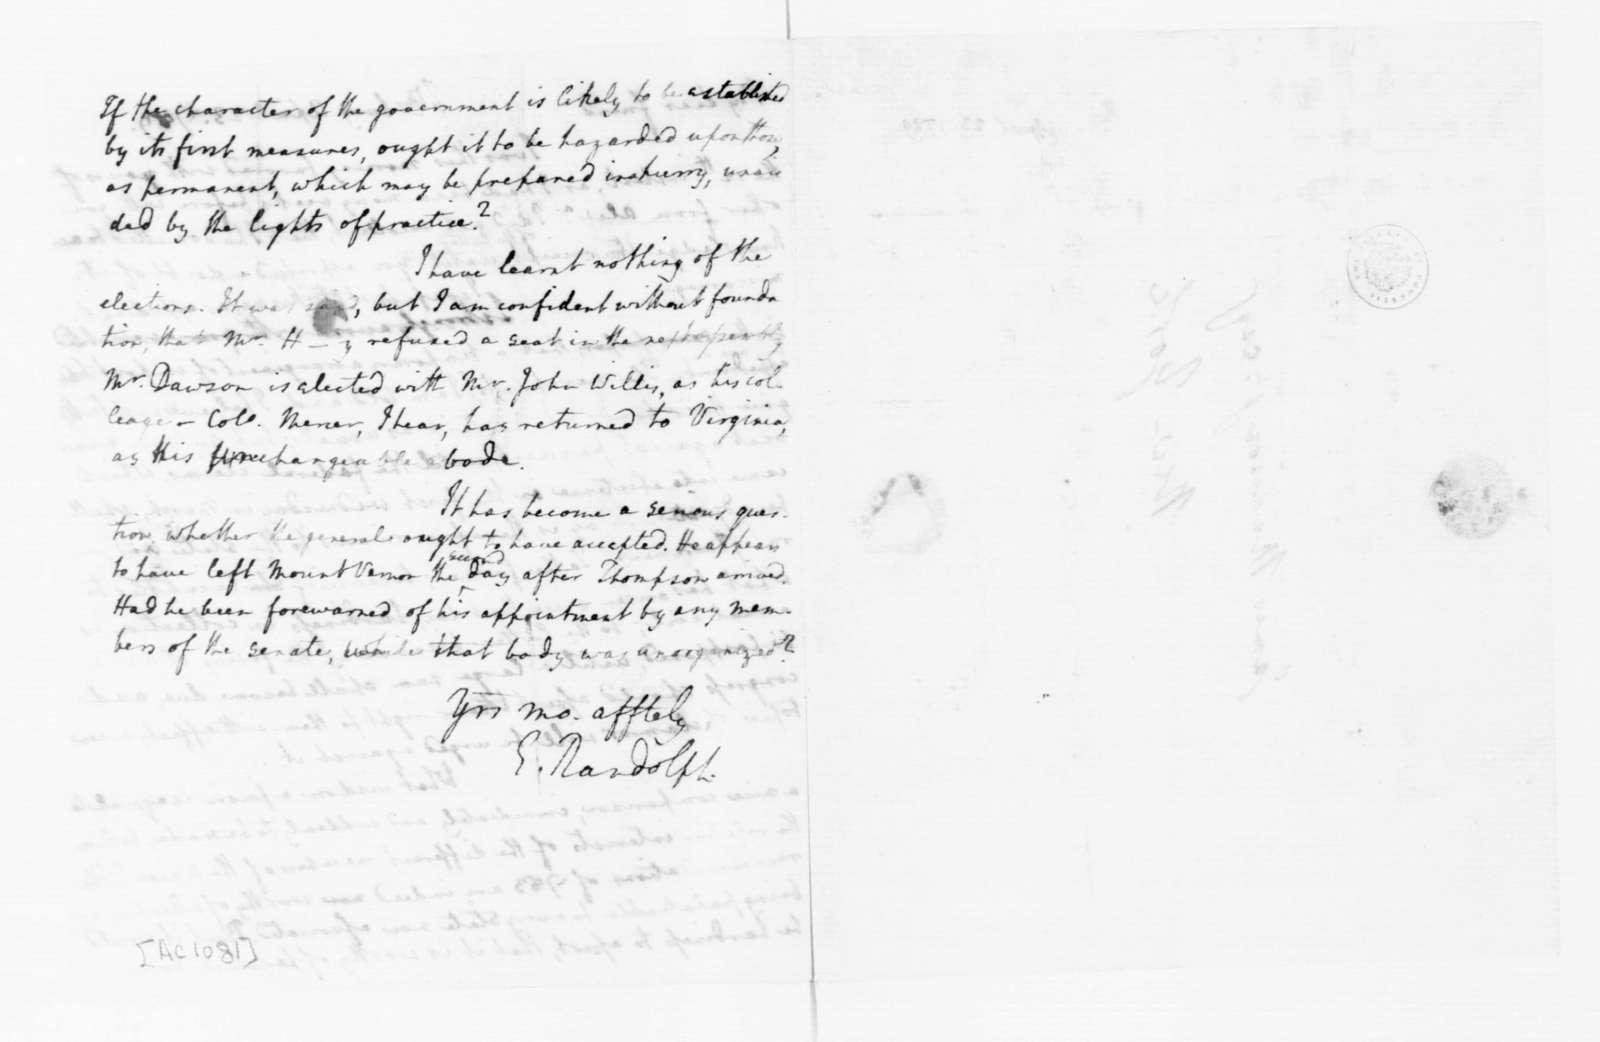 Edmund Randolph to James Madison, April 23, 1789.